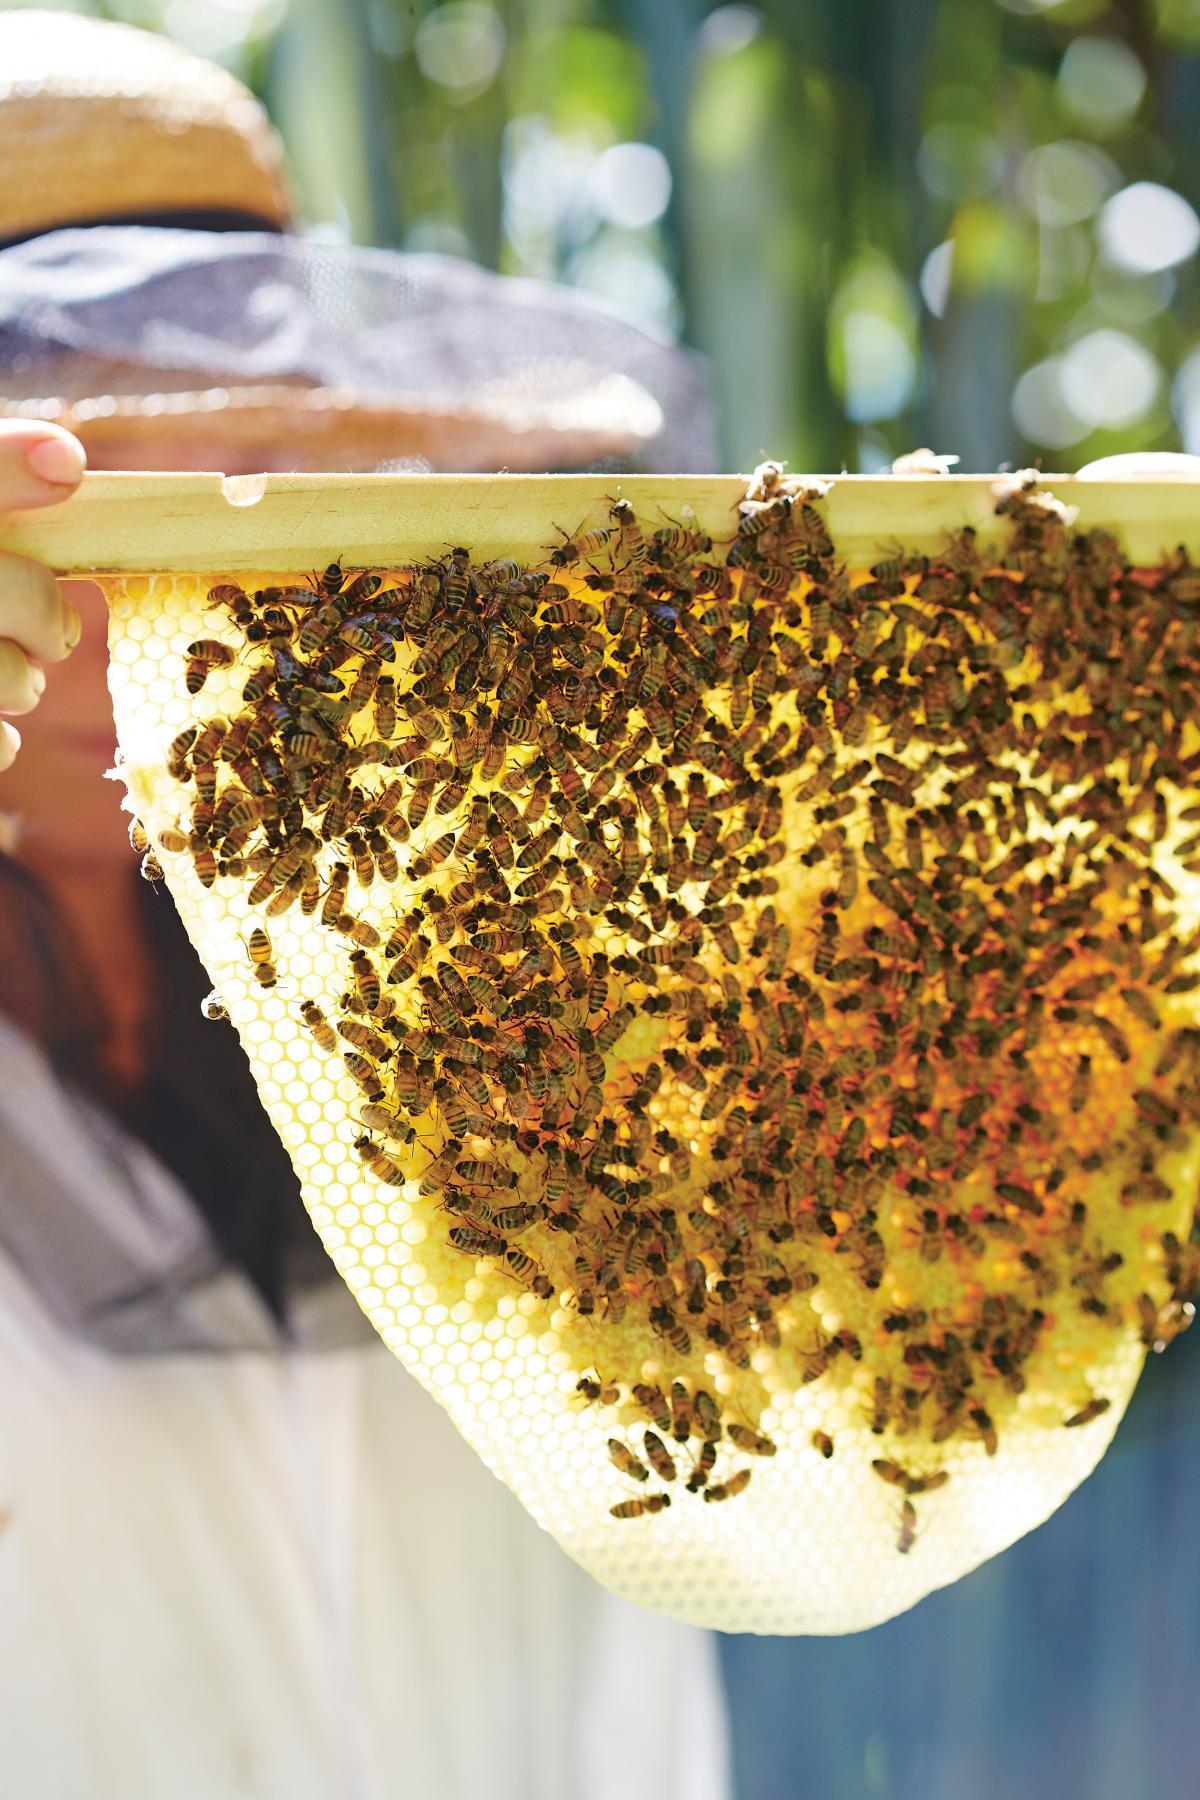 Make your garden bee-friendly